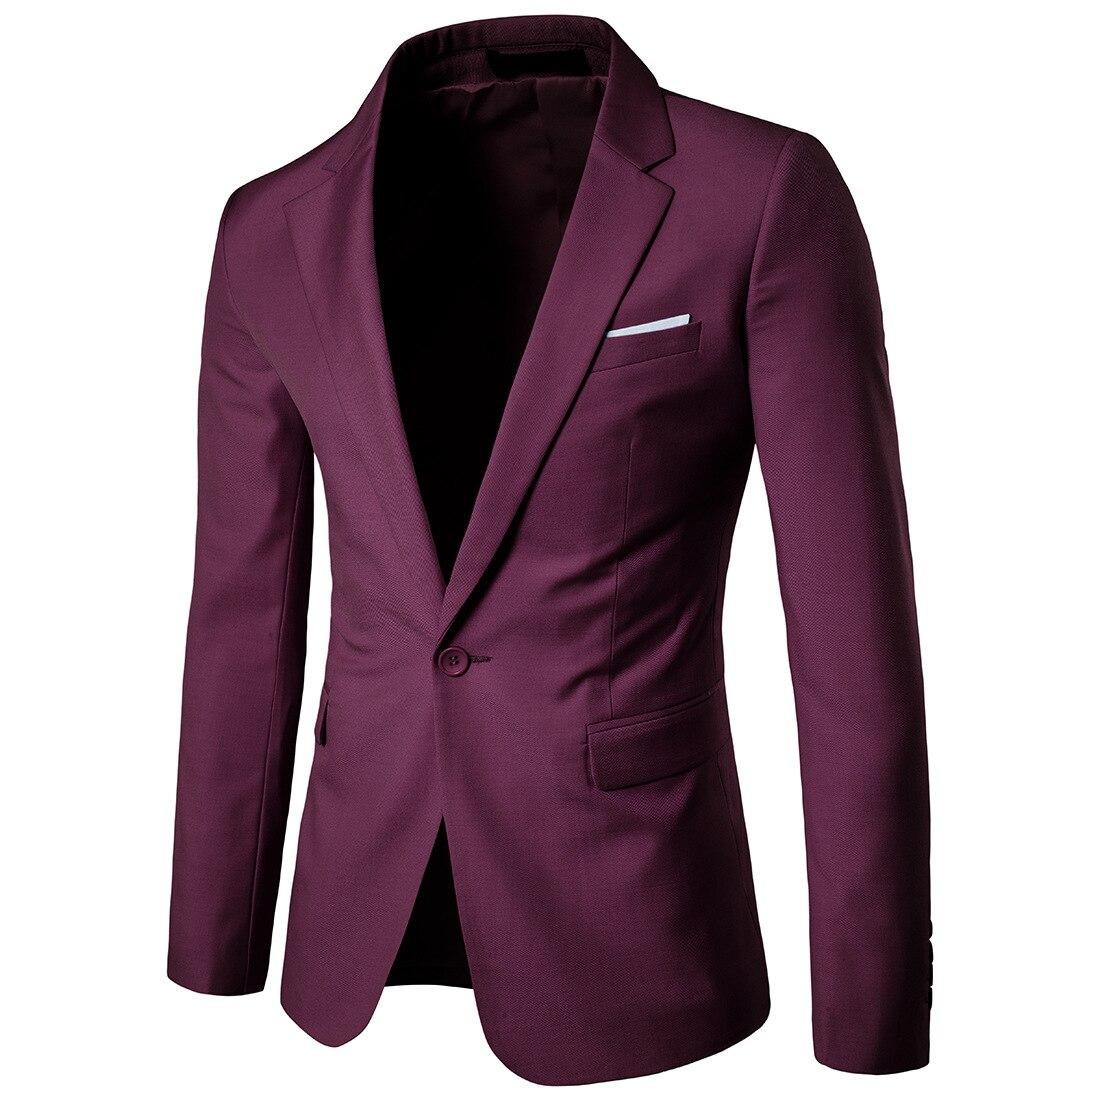 2019 Business Leisure Suit Lang Best Man Wedding One-Button Suit Jacket Men'S Wear Navy Xf001 West